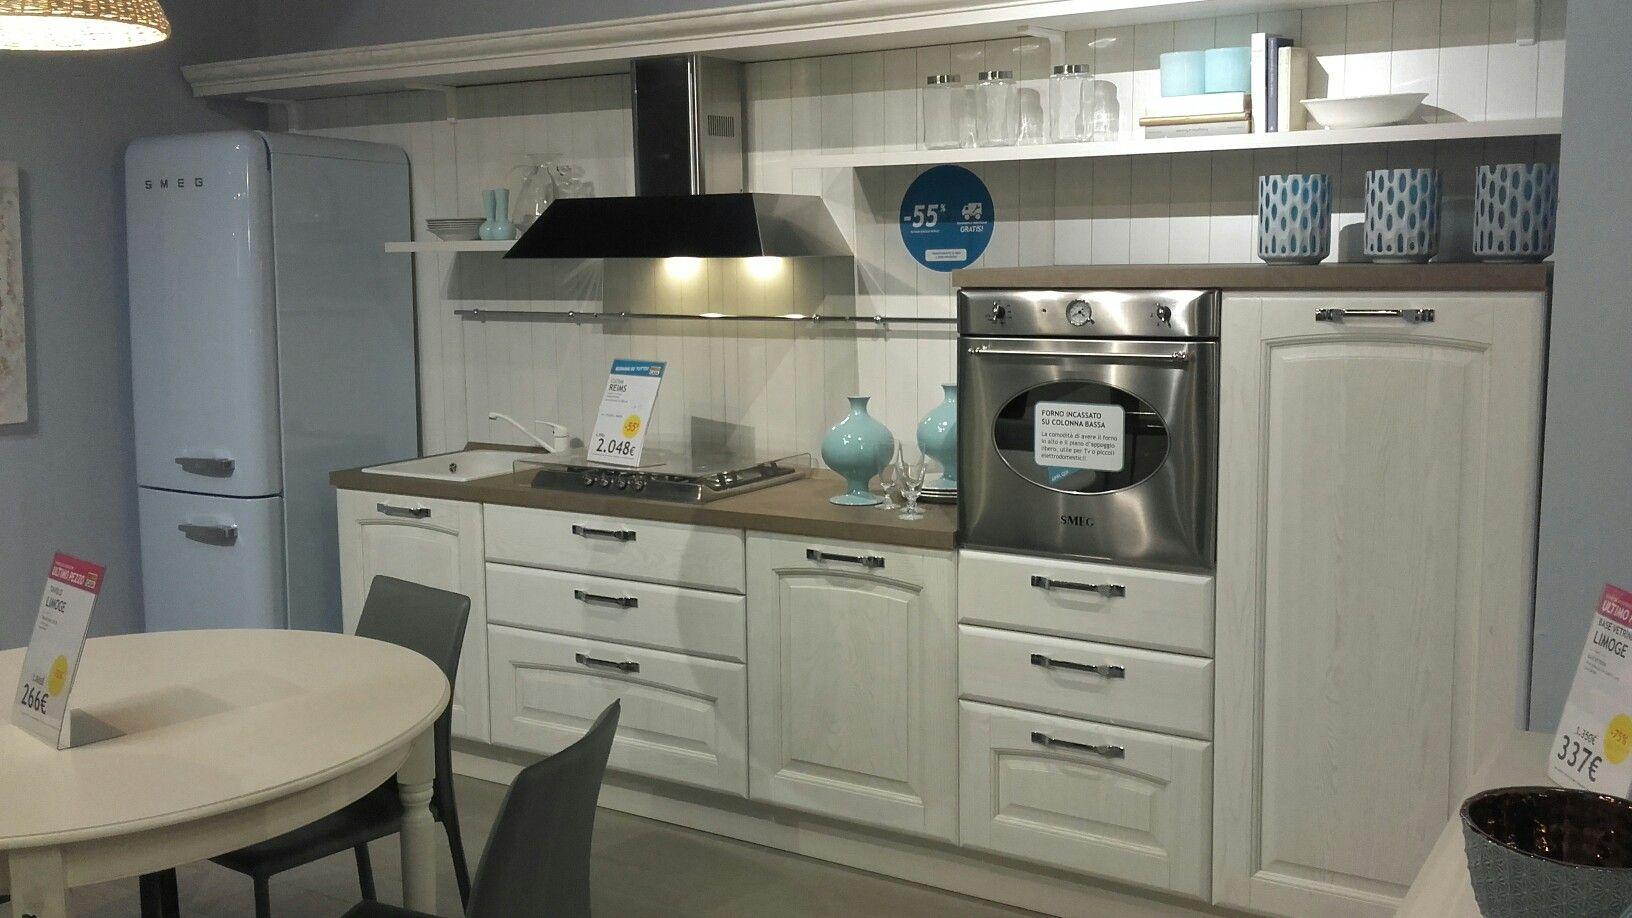 cucina ricci casa | kitchens | pinterest | cucina - Cucina Ricci Casa